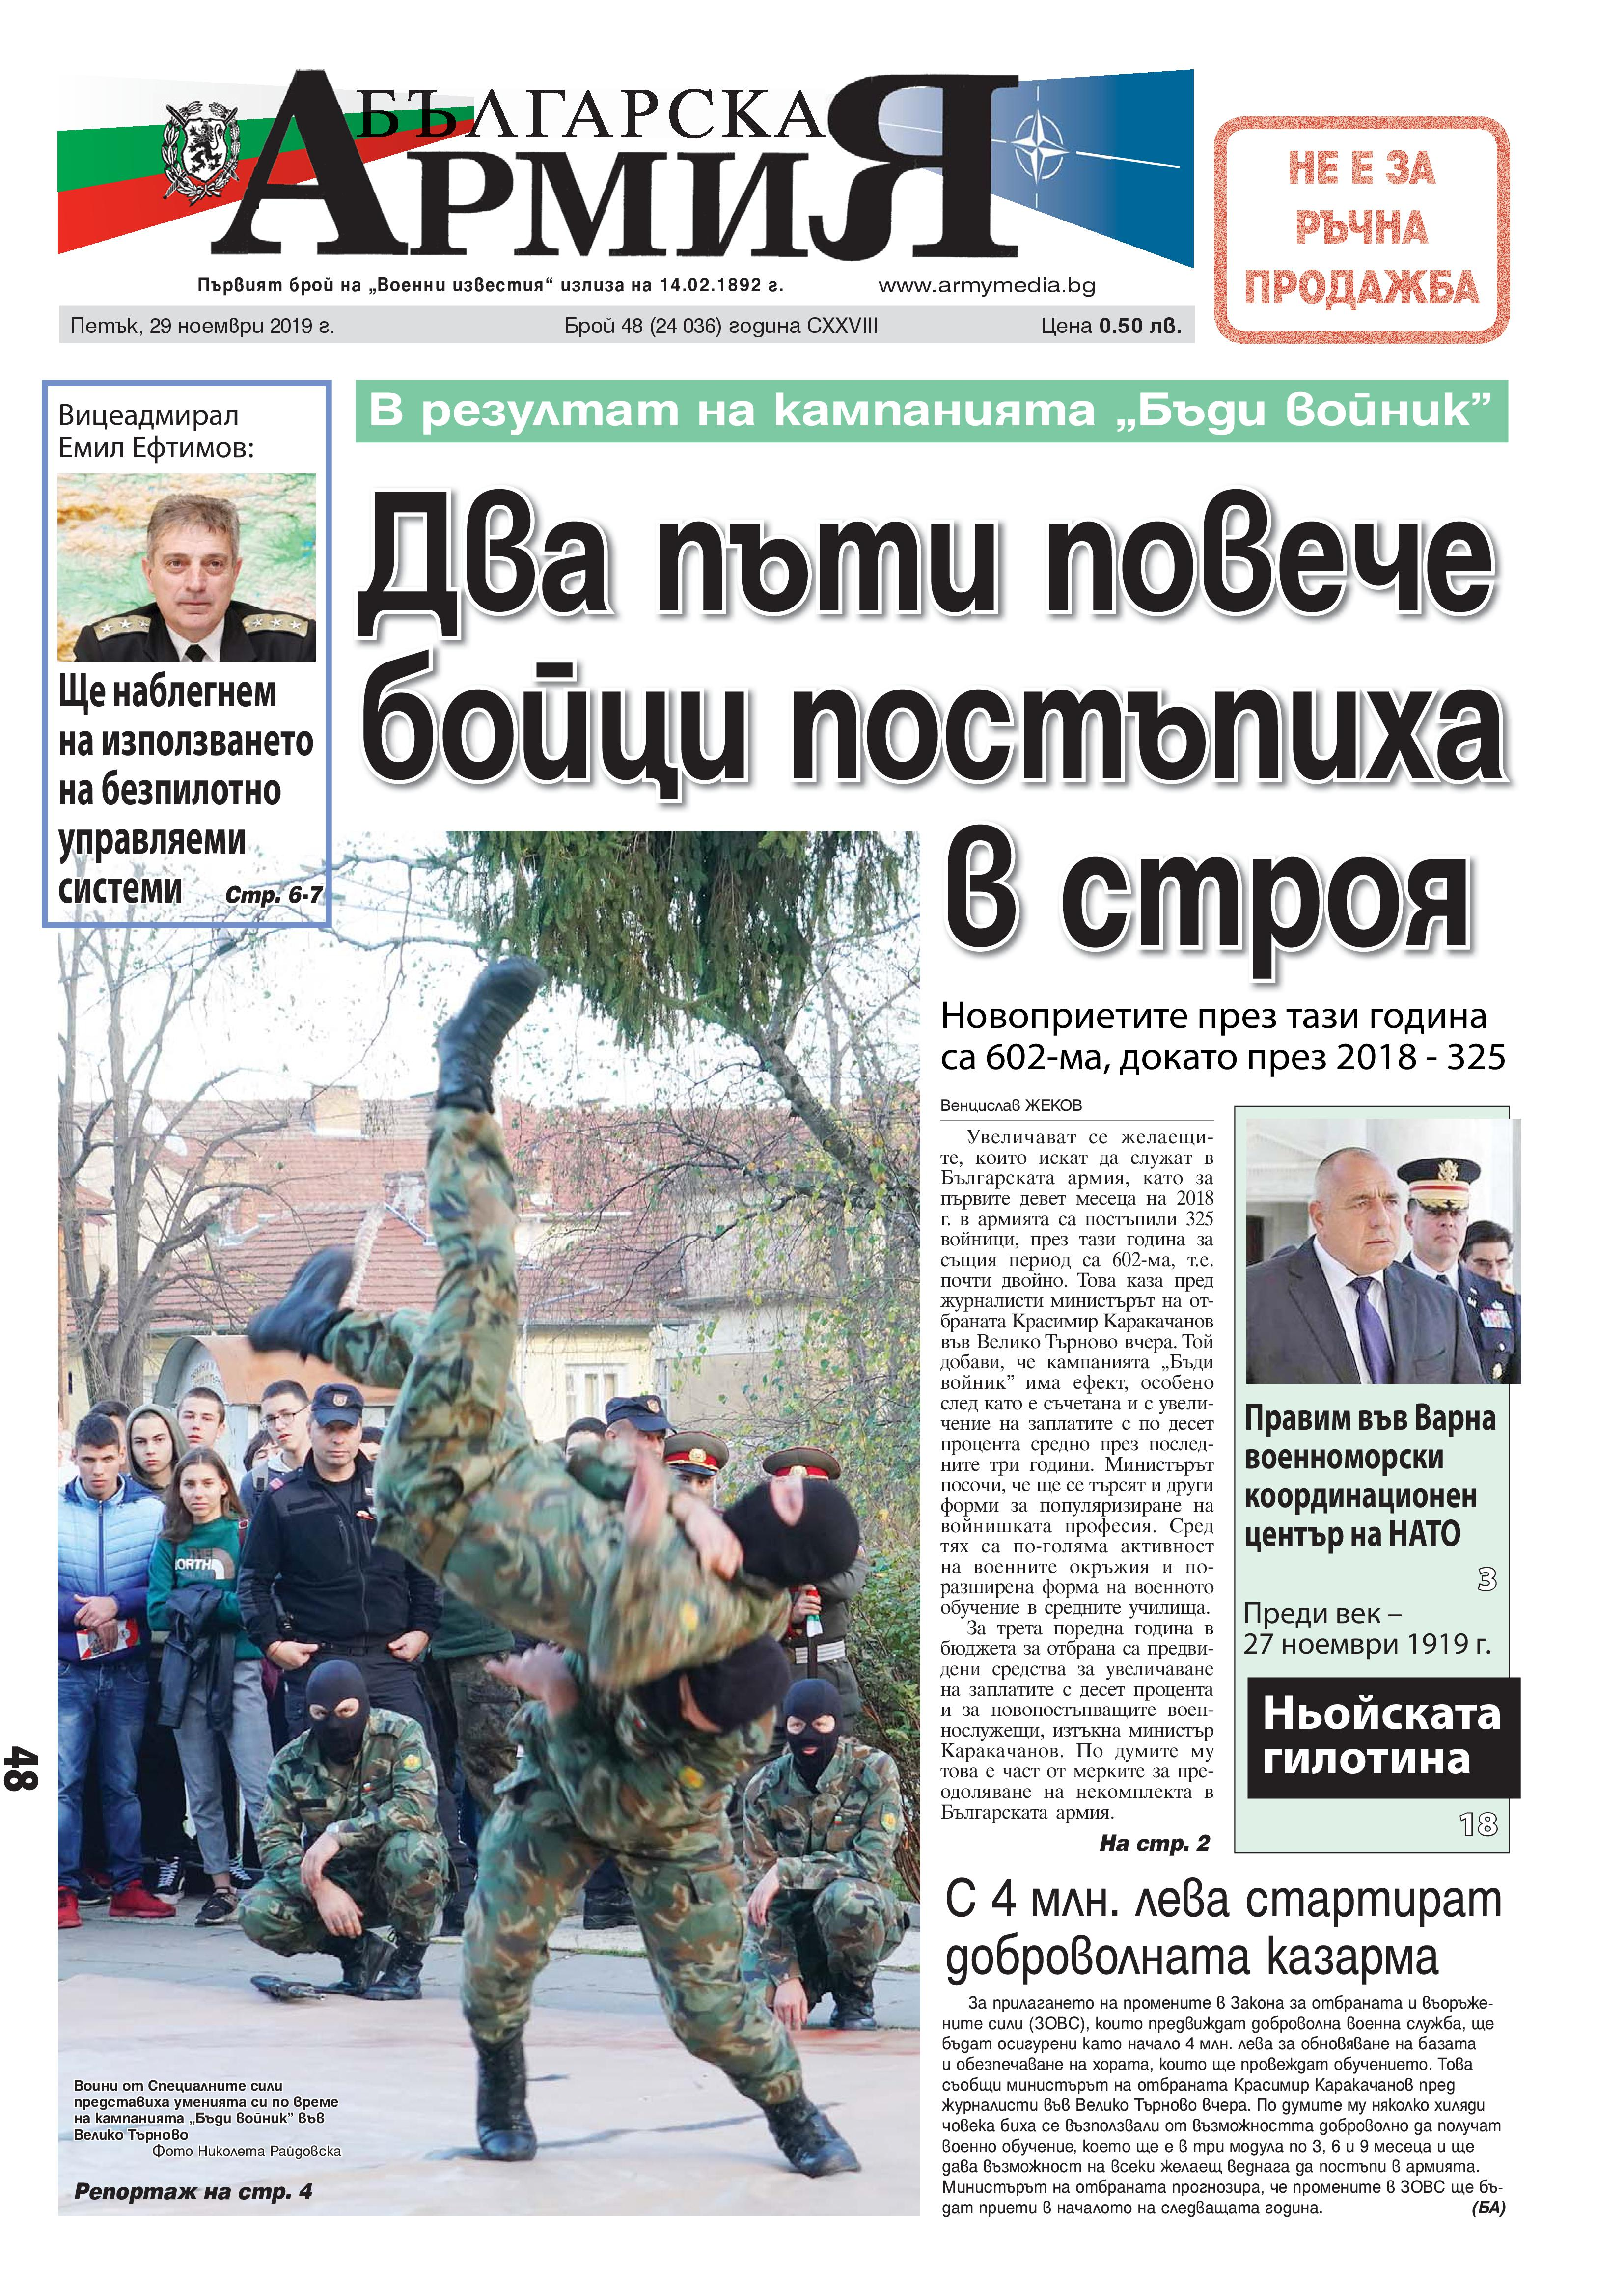 https://armymedia.bg/wp-content/uploads/2015/06/01-33.jpg